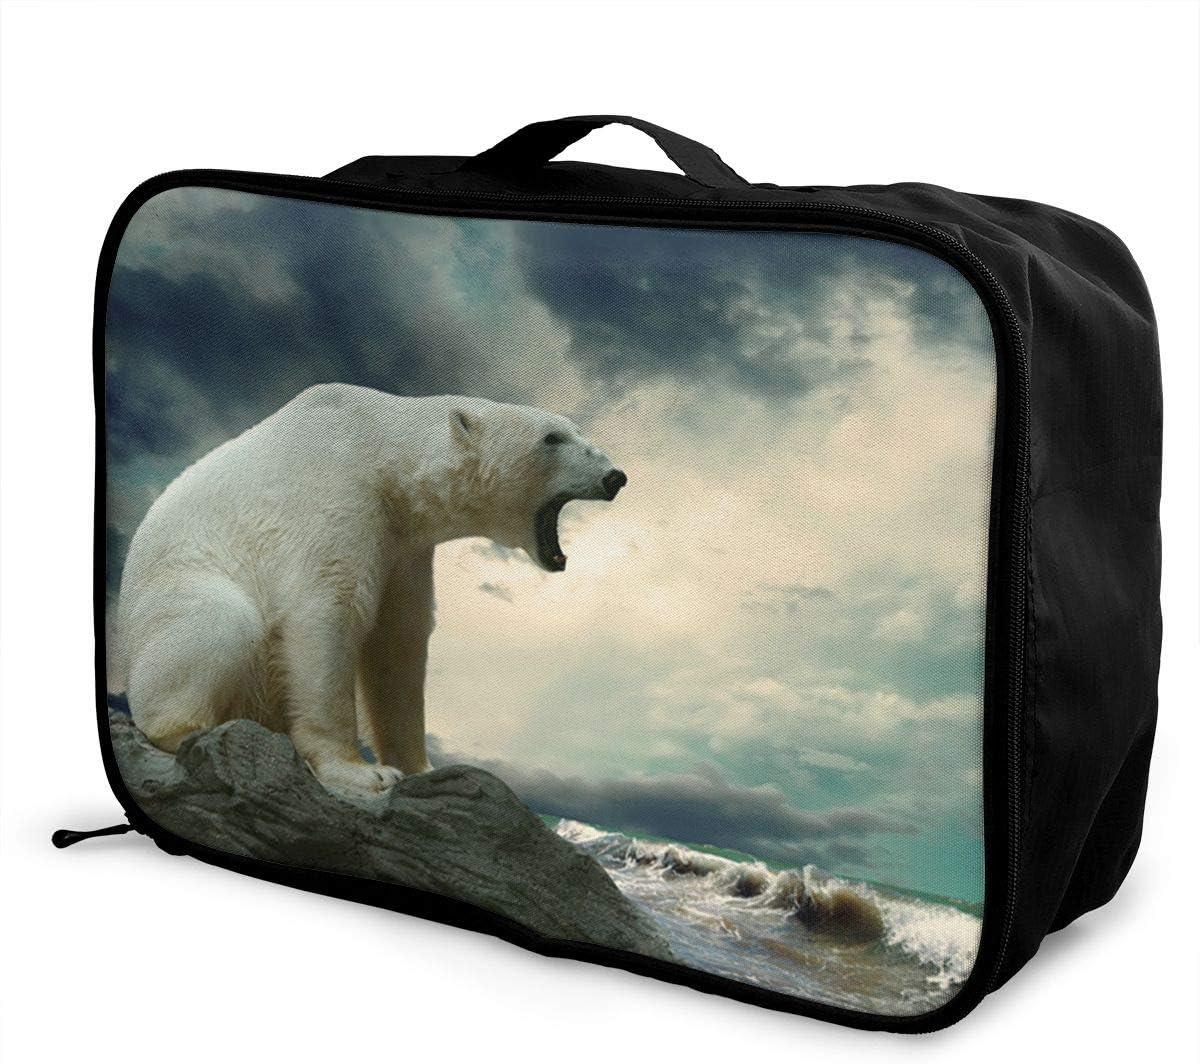 Polar-bear Travel Carry-on Luggage Weekender Bag Overnight Tote Flight Duffel In Trolley Handle